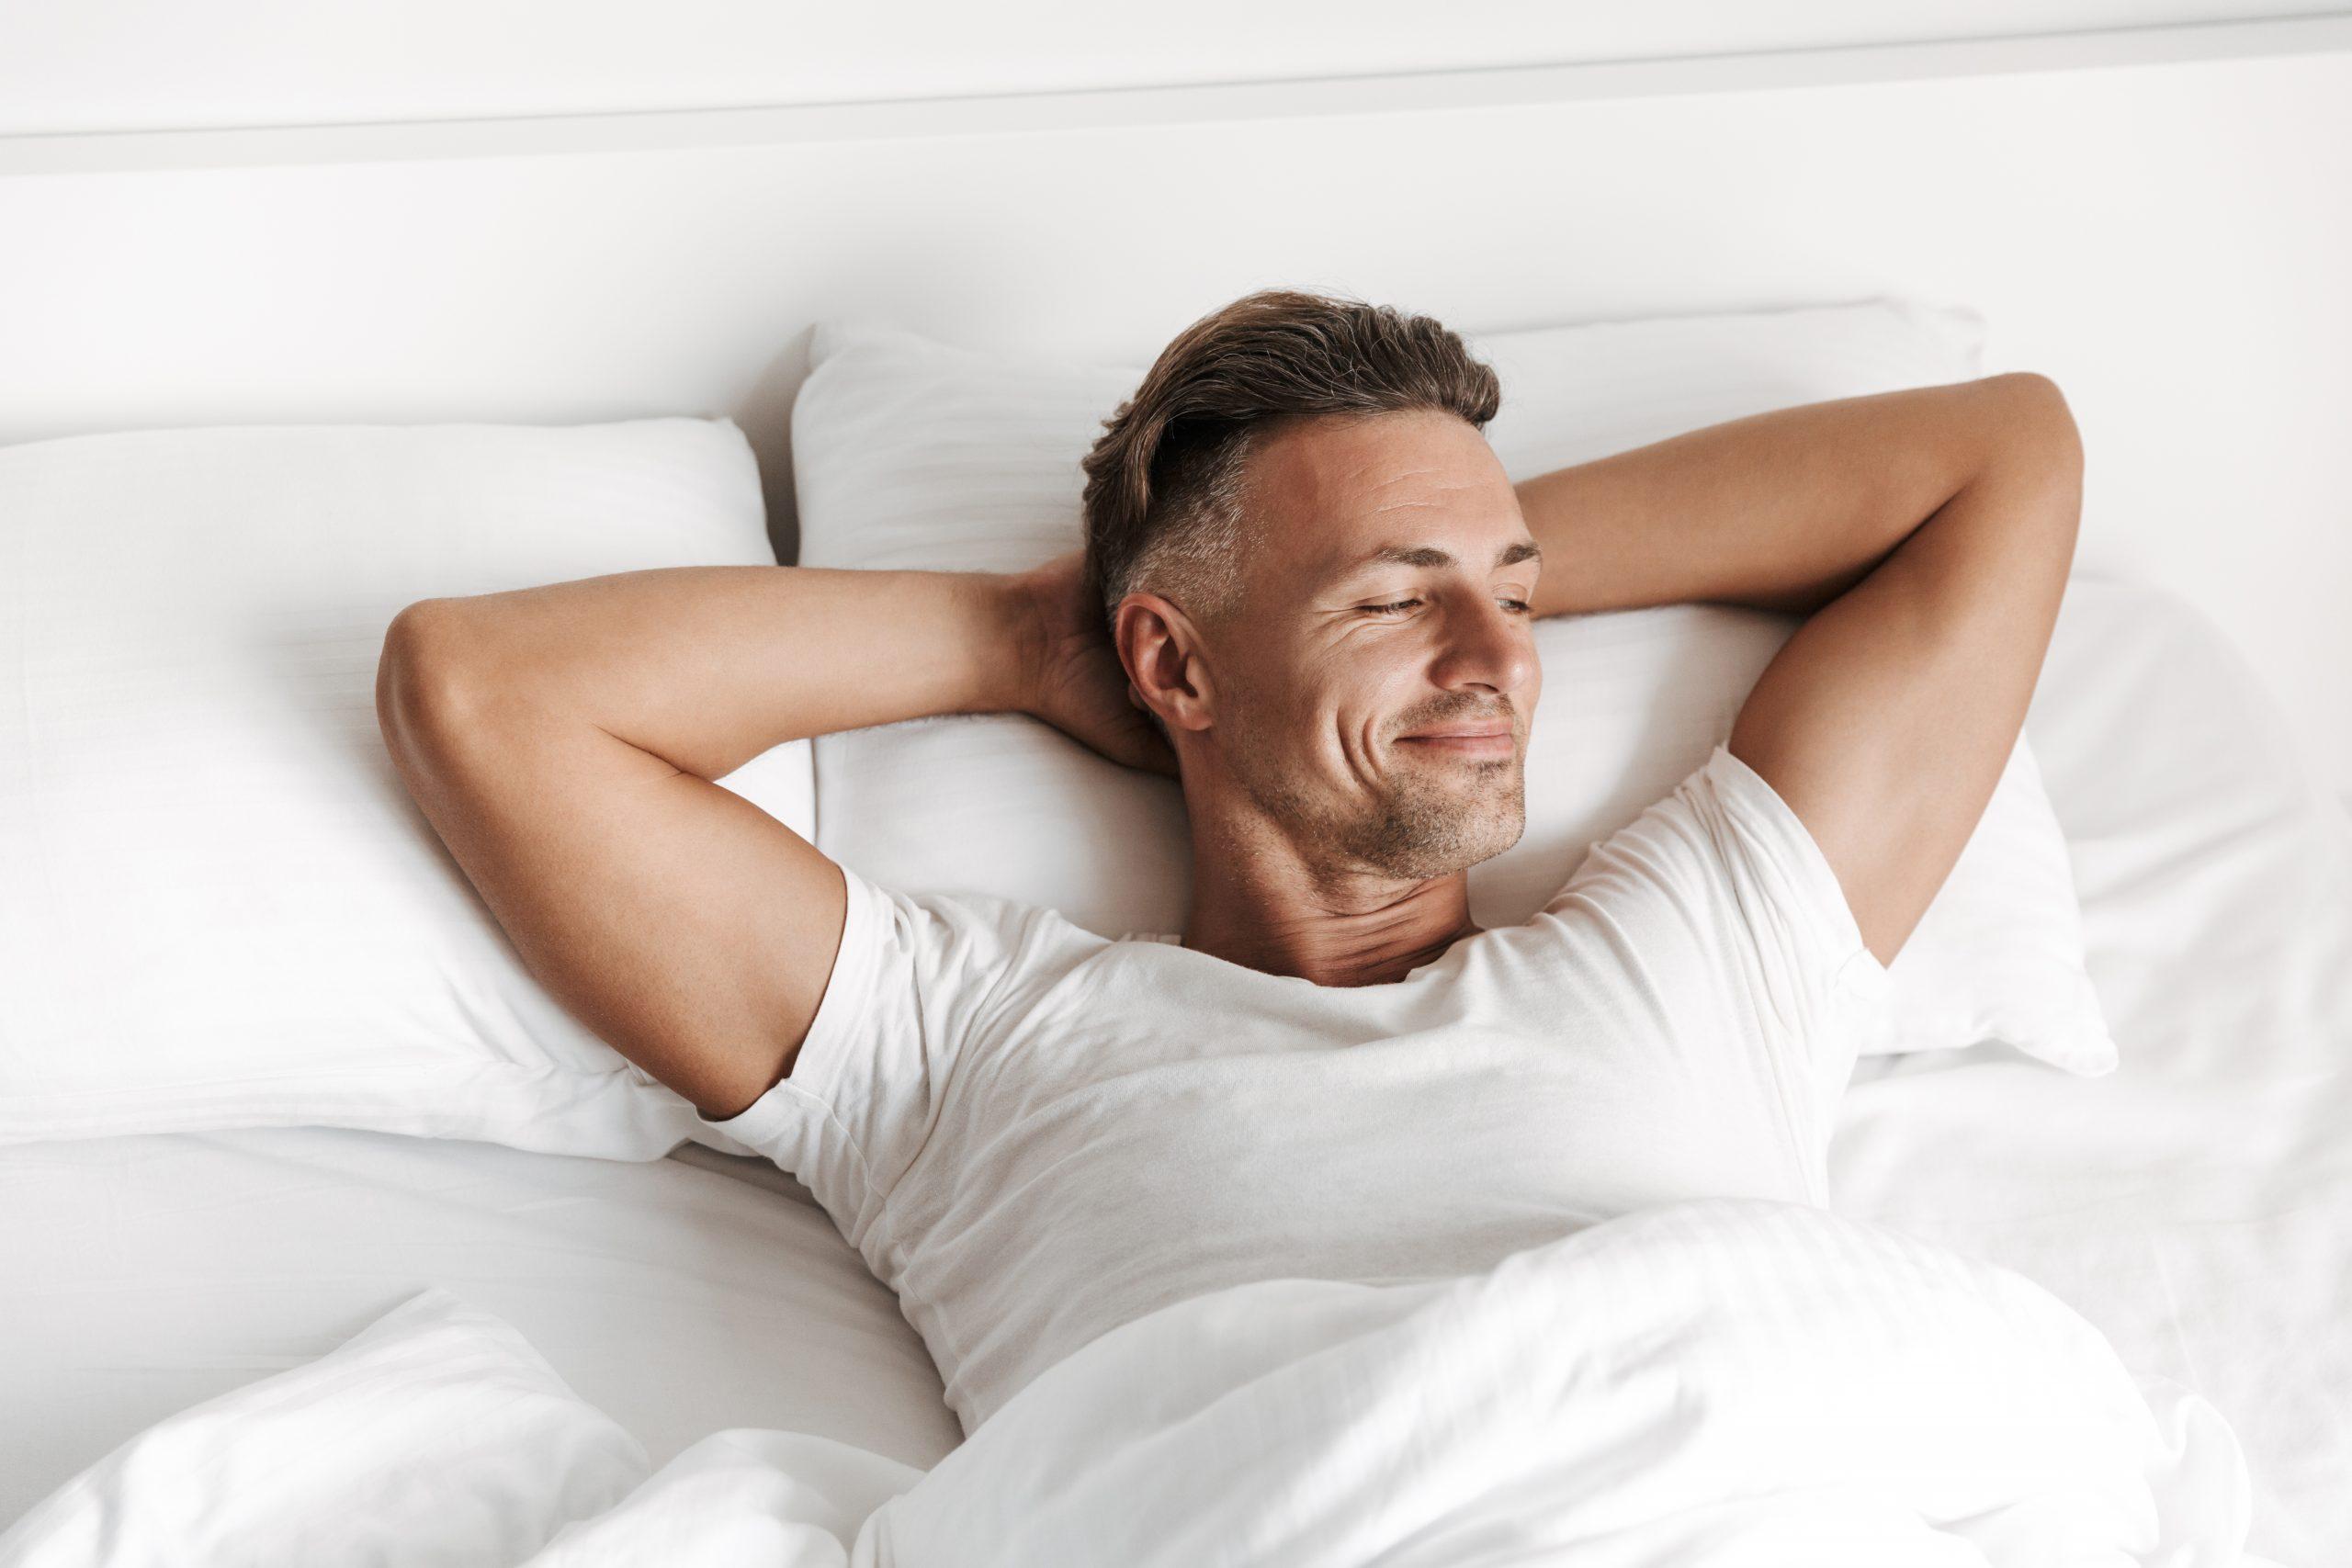 Satisfied man relaxing in bed